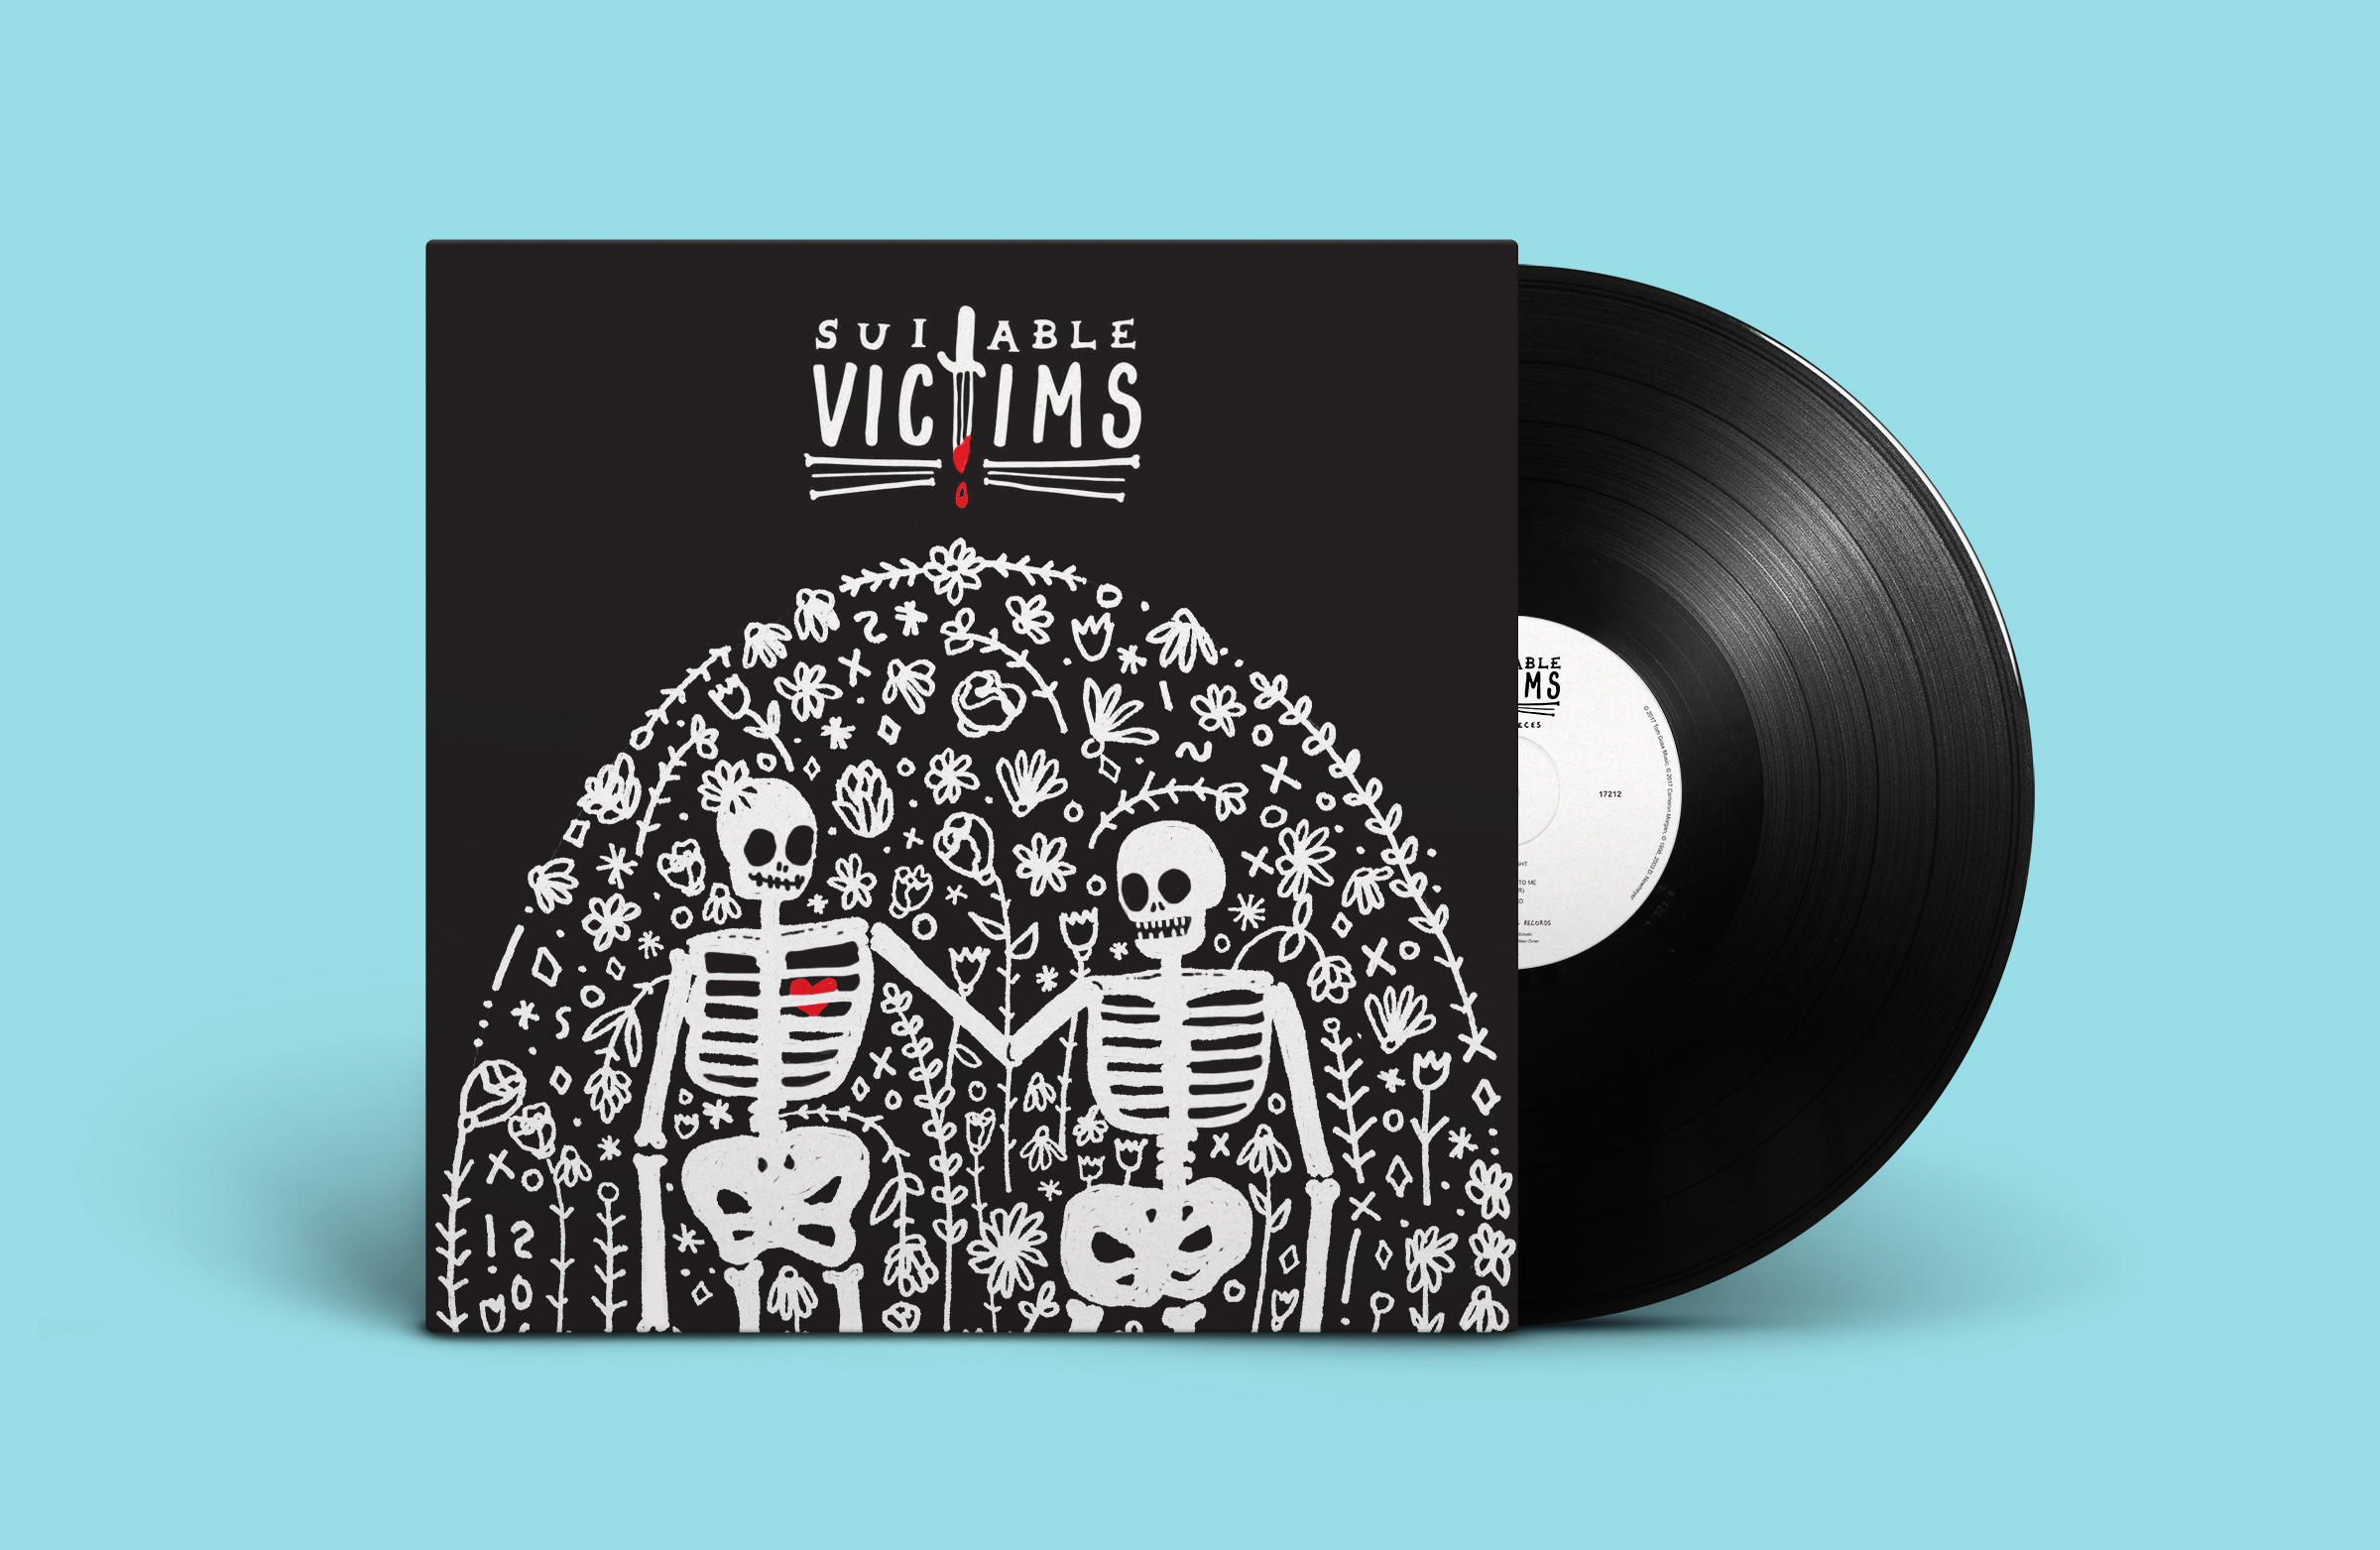 Vinyl-Record-PSD-MockUp.png